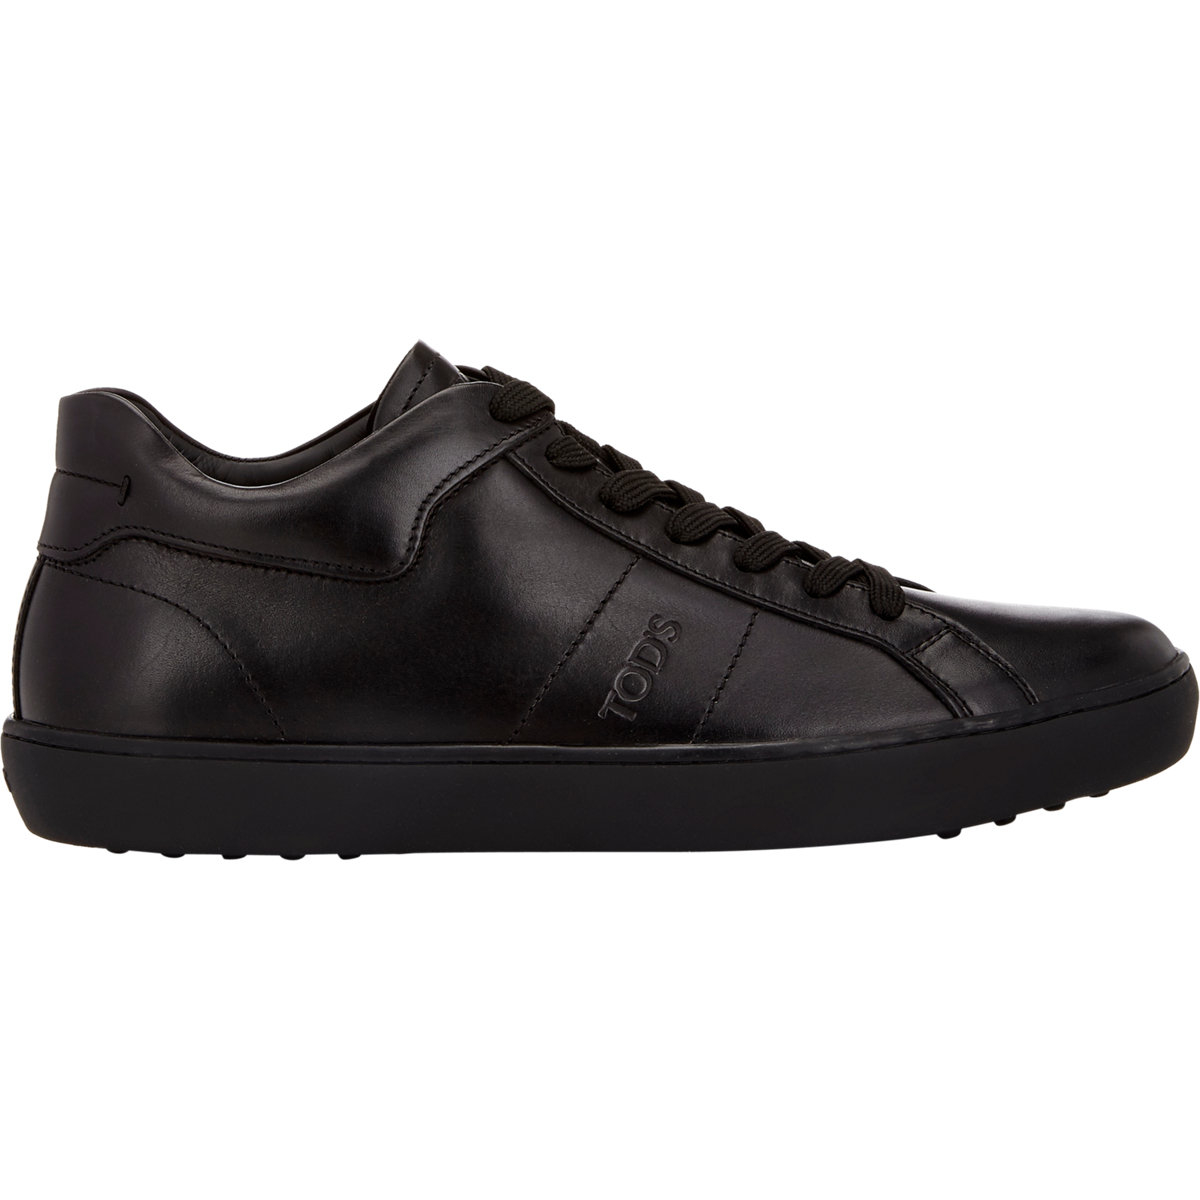 Chaussures De Sport Bas-top - Tod Noir De Vor94f